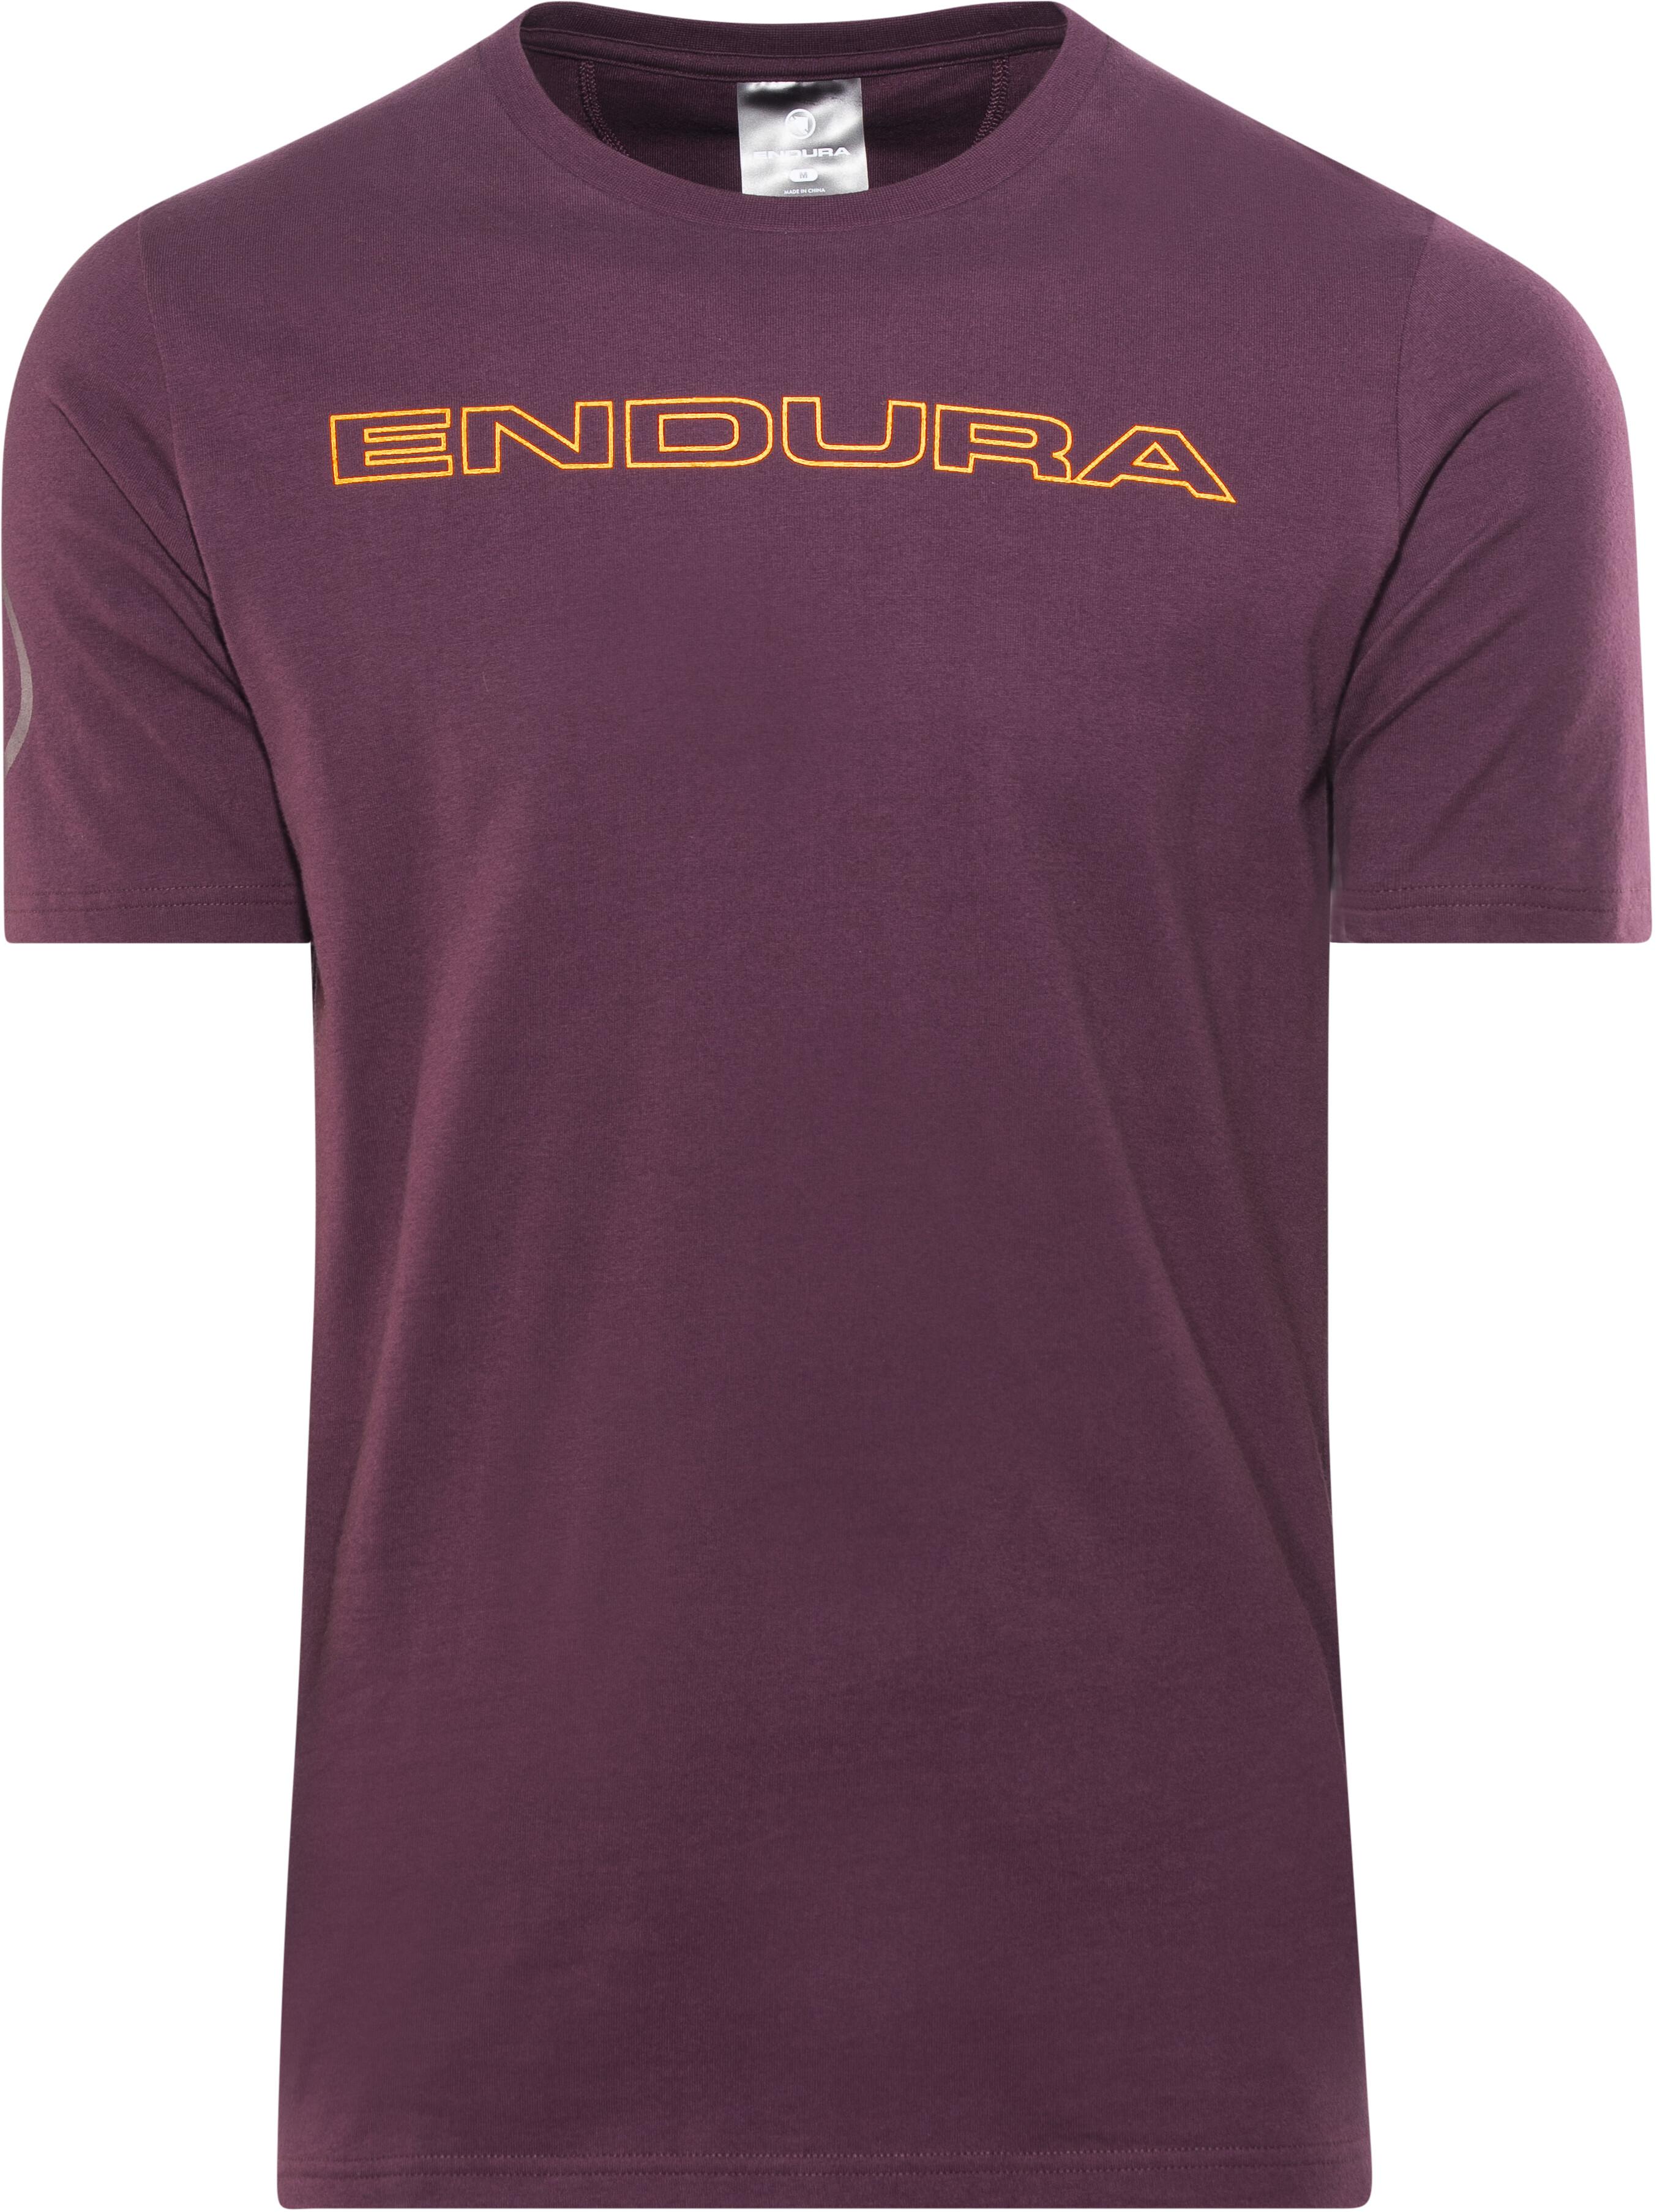 daa00c350371a Endura One Clan Carbon T-Shirt violett - till fenomenalt pris på ...